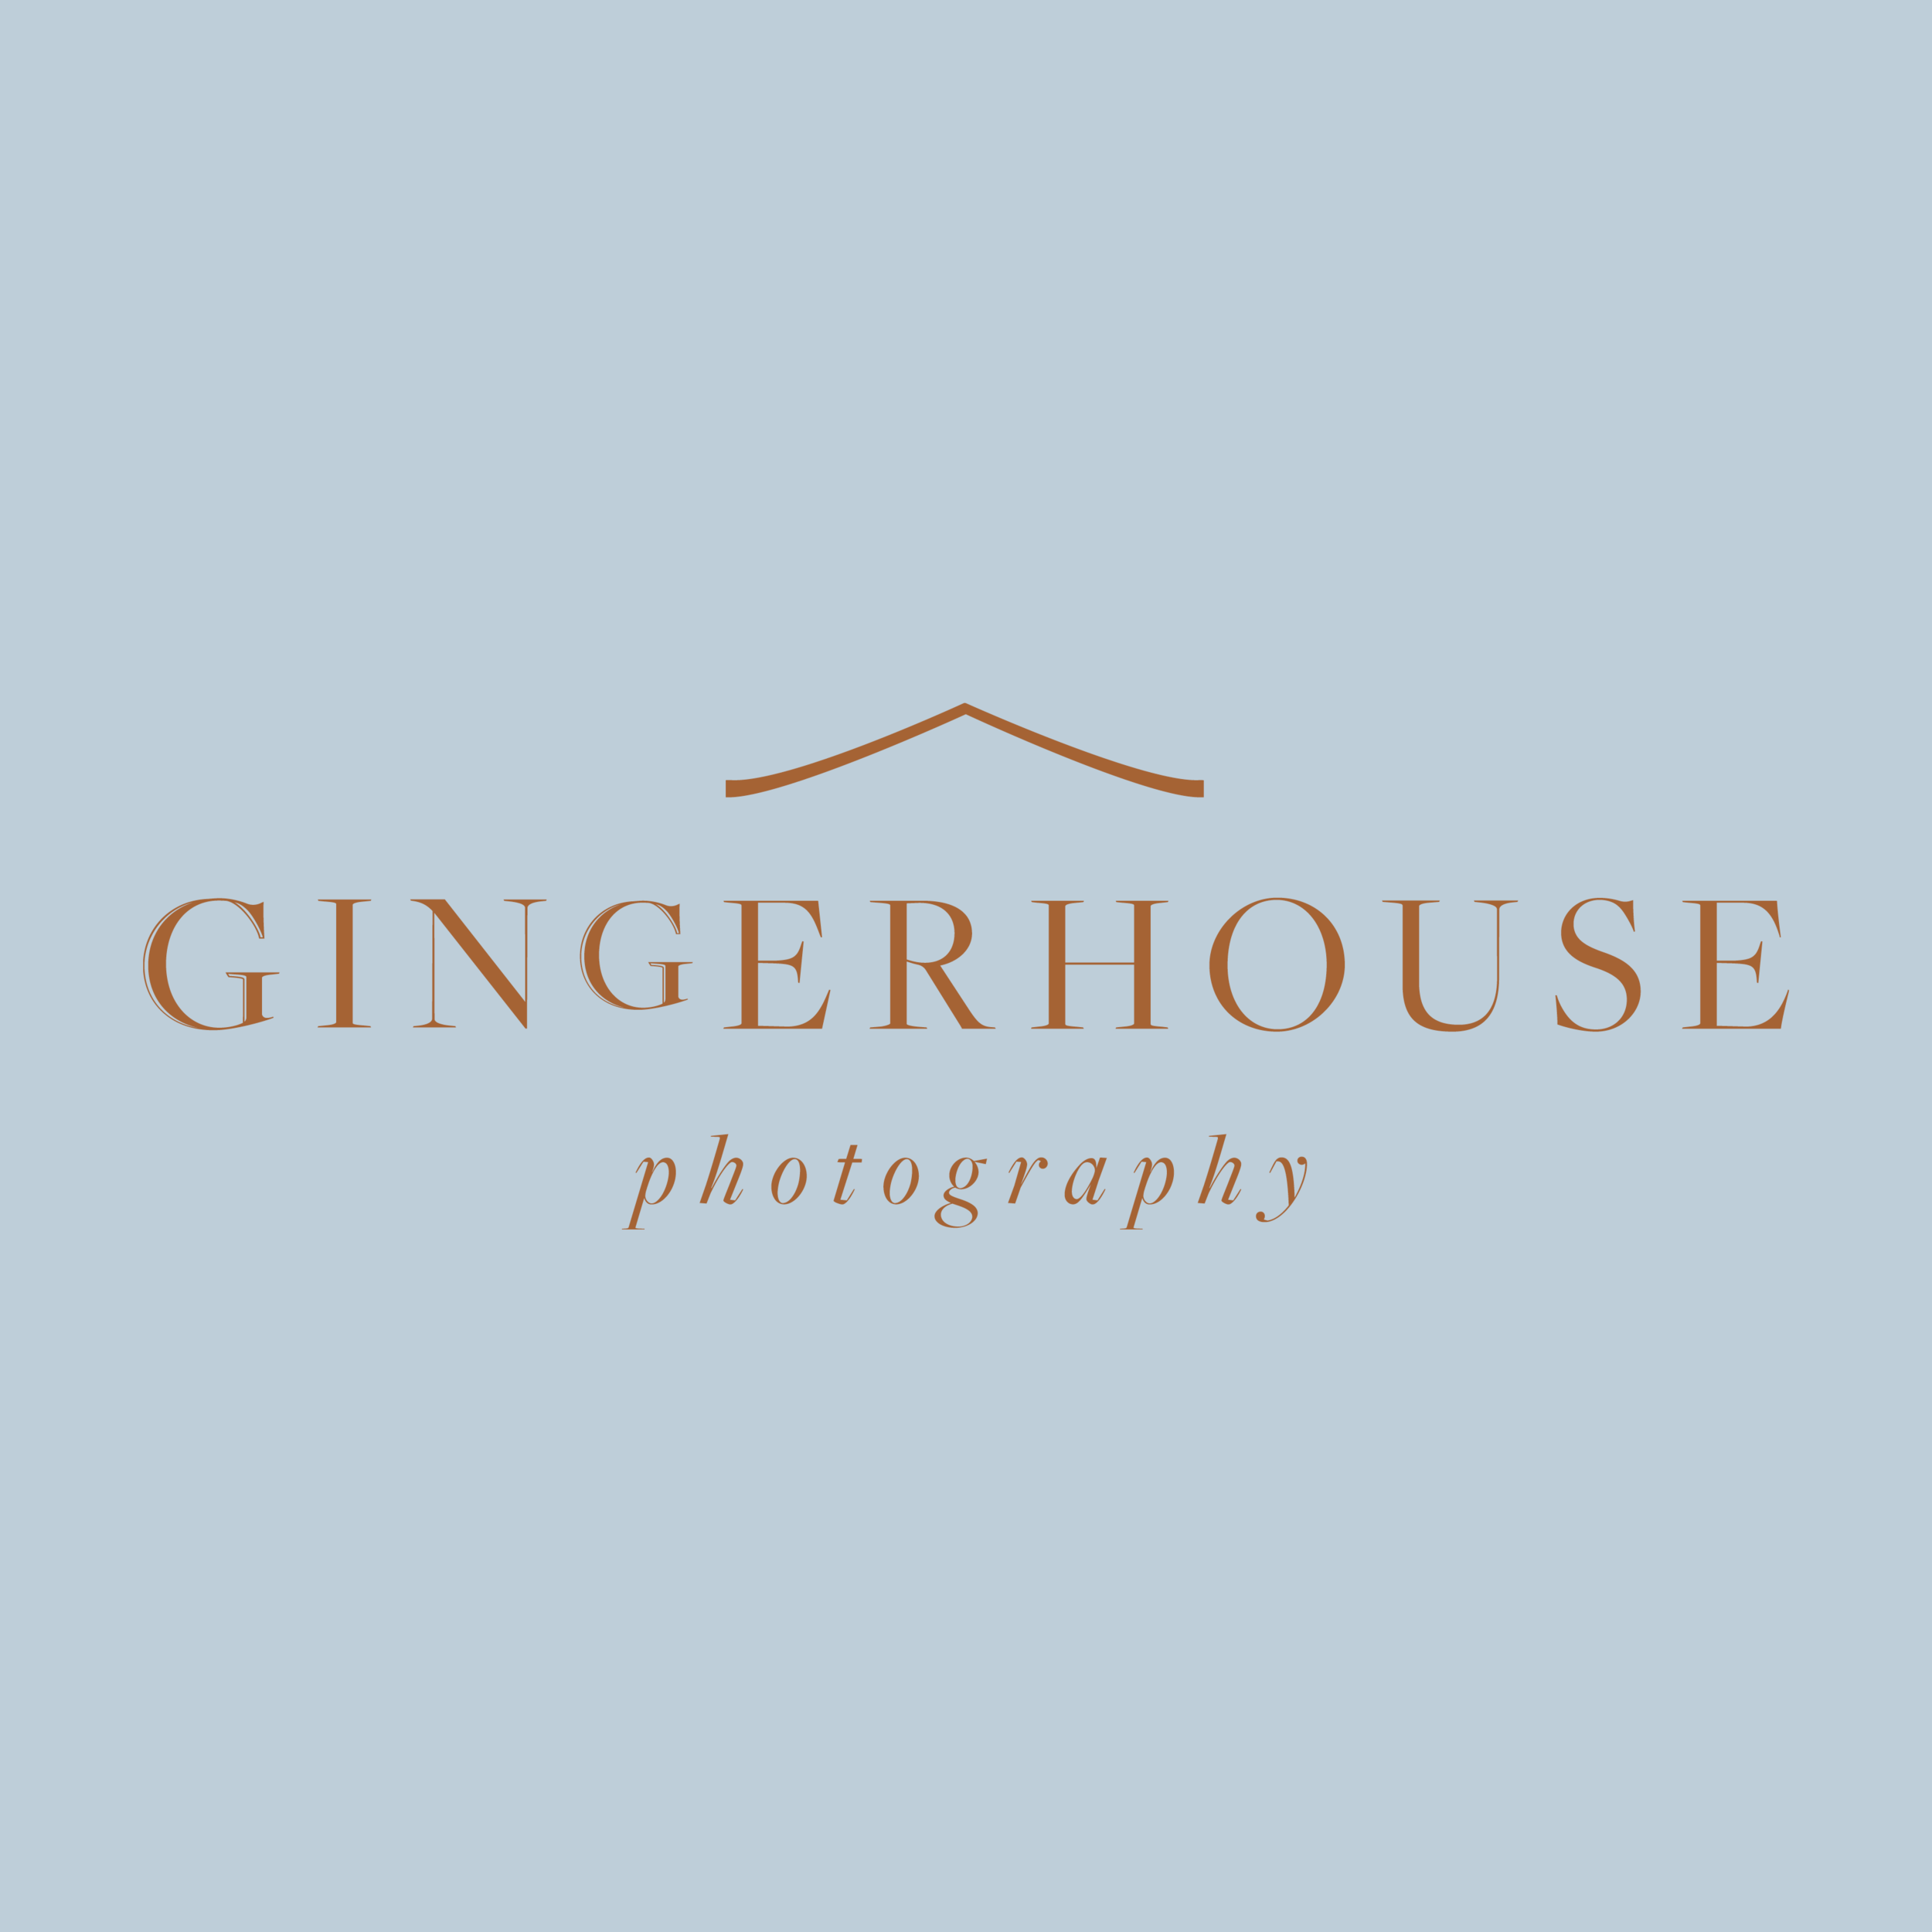 Gingerhouse Photography - Kira Hyde Creative